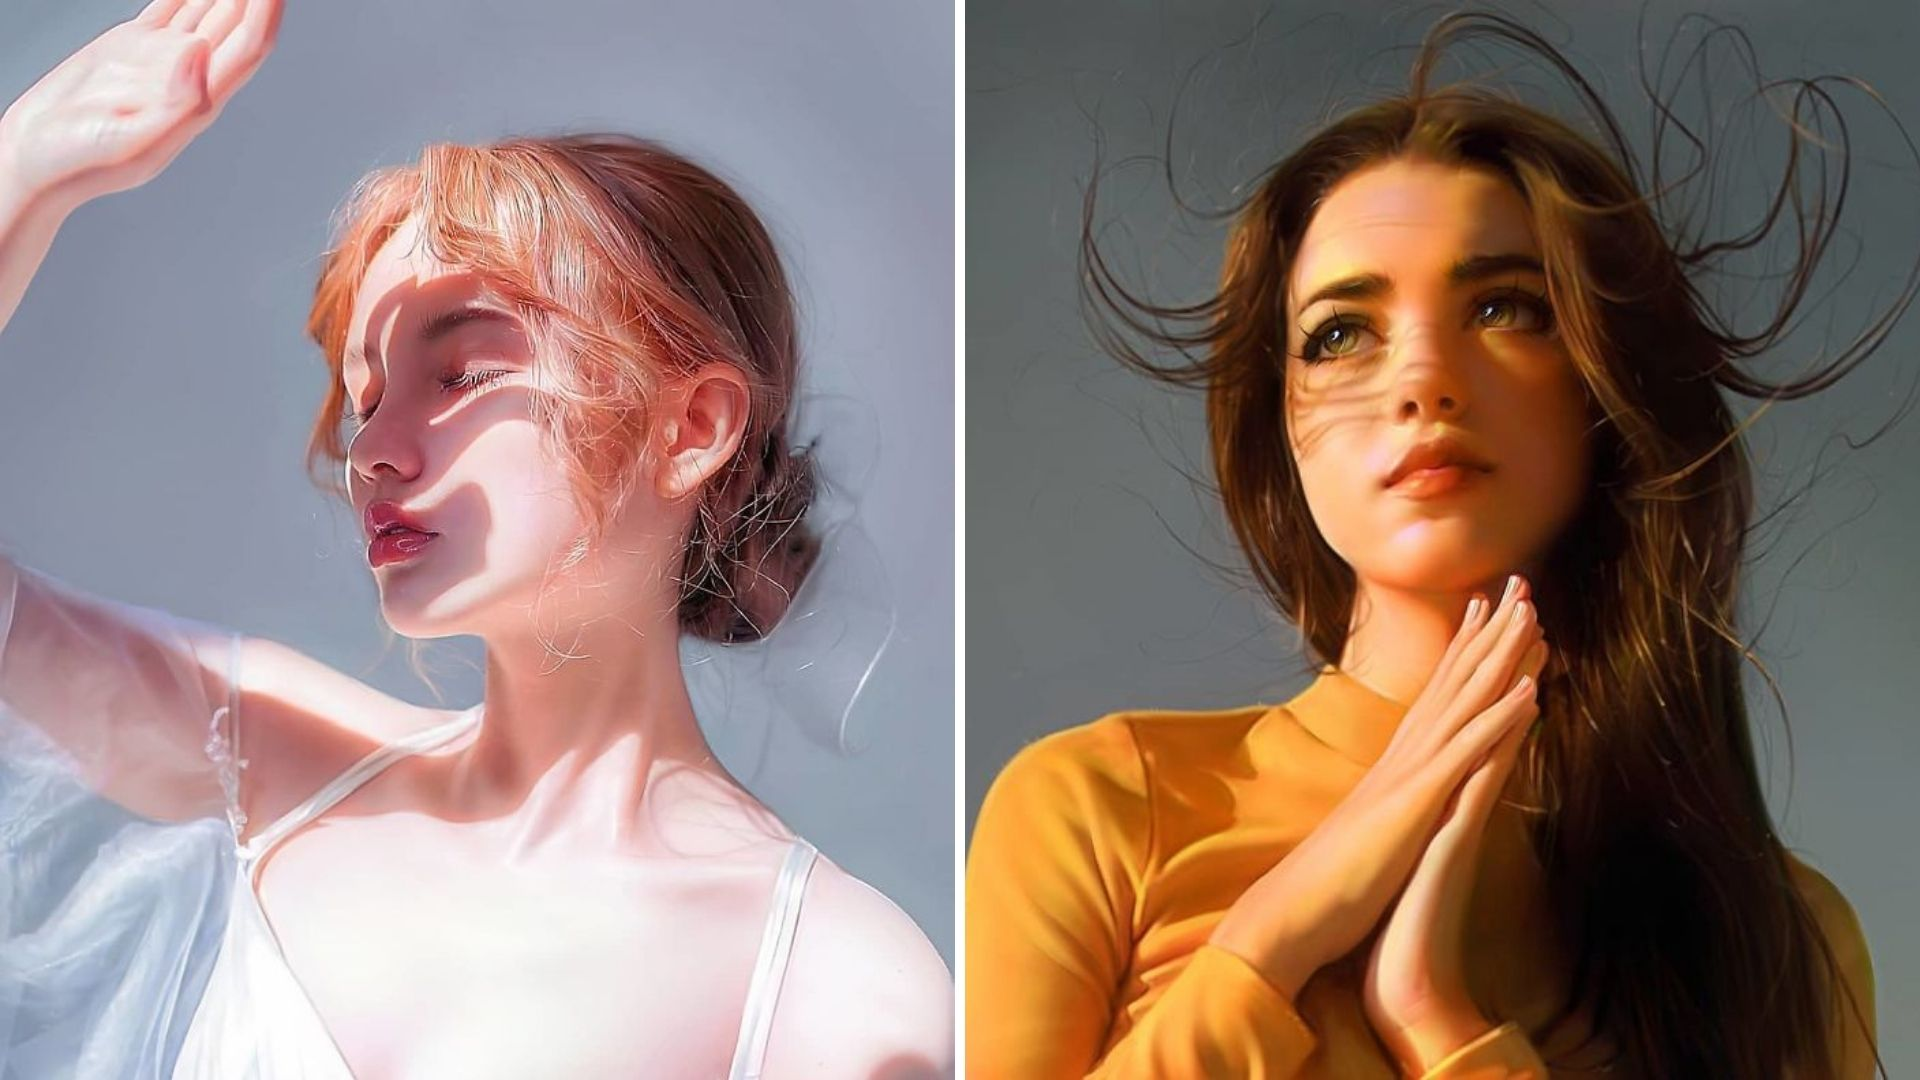 A incrível arte realista de Irakli Nadar